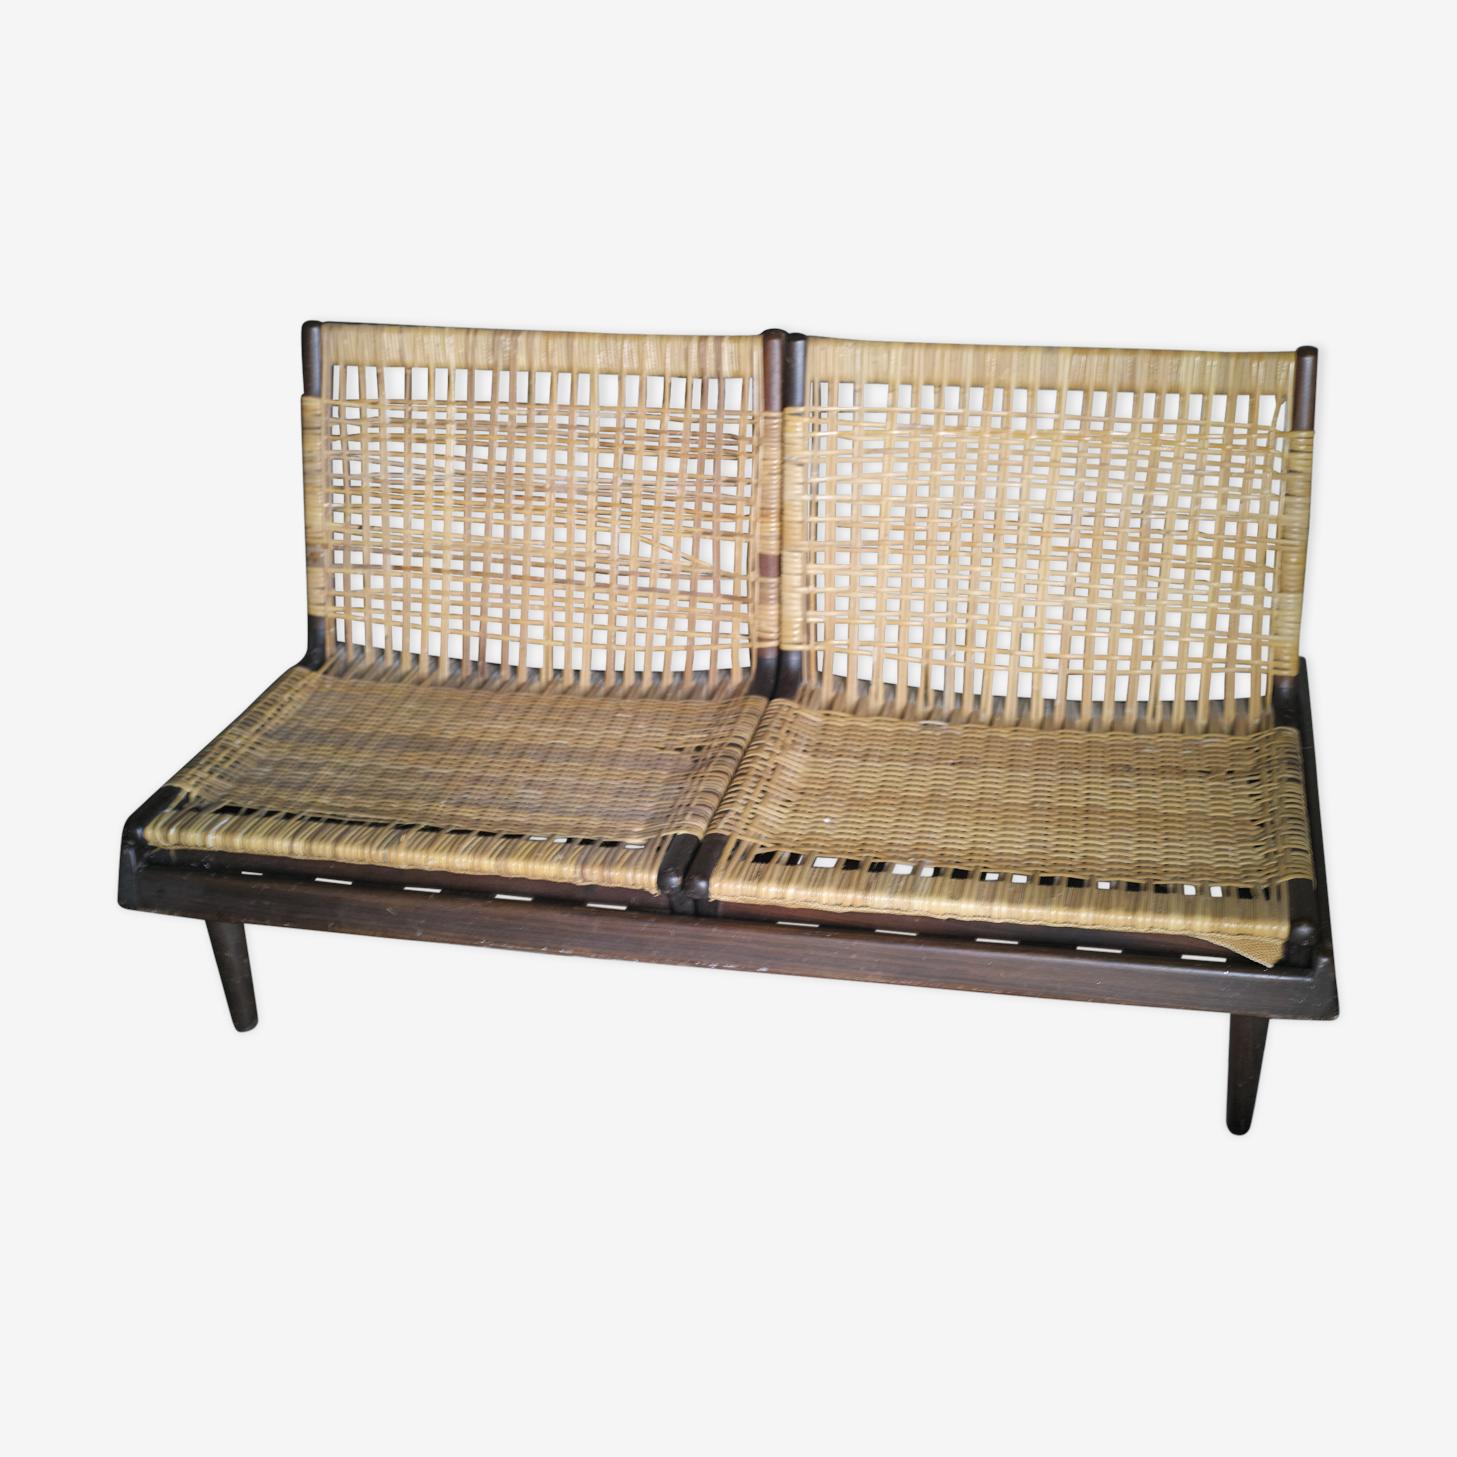 Canapé scandinave années 50 modular sofa de Hans Olsen pour Bramin